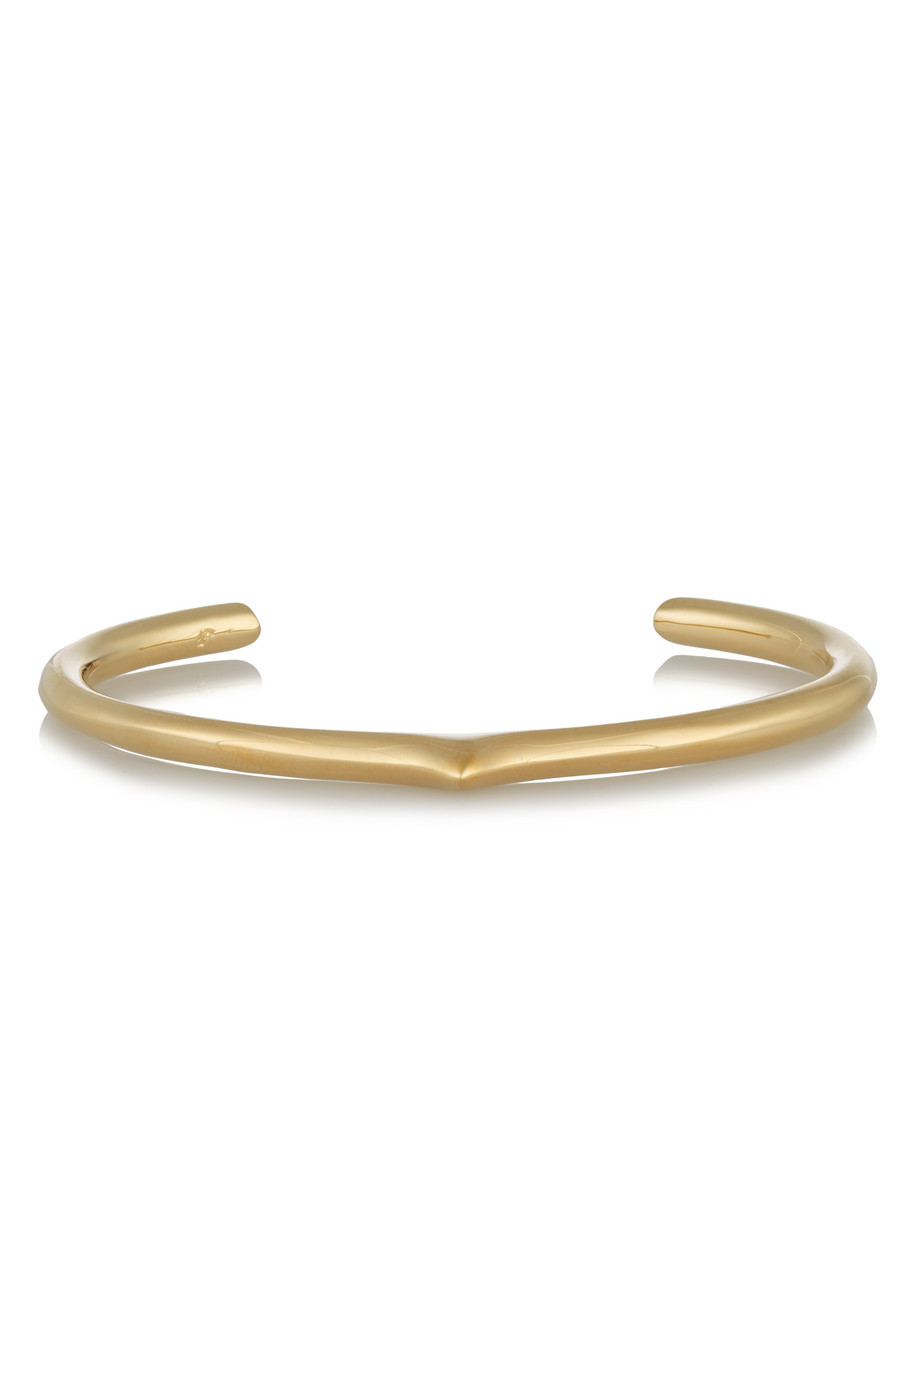 Jennifer Fisher Peak Gold-Plated Cuff, Women's